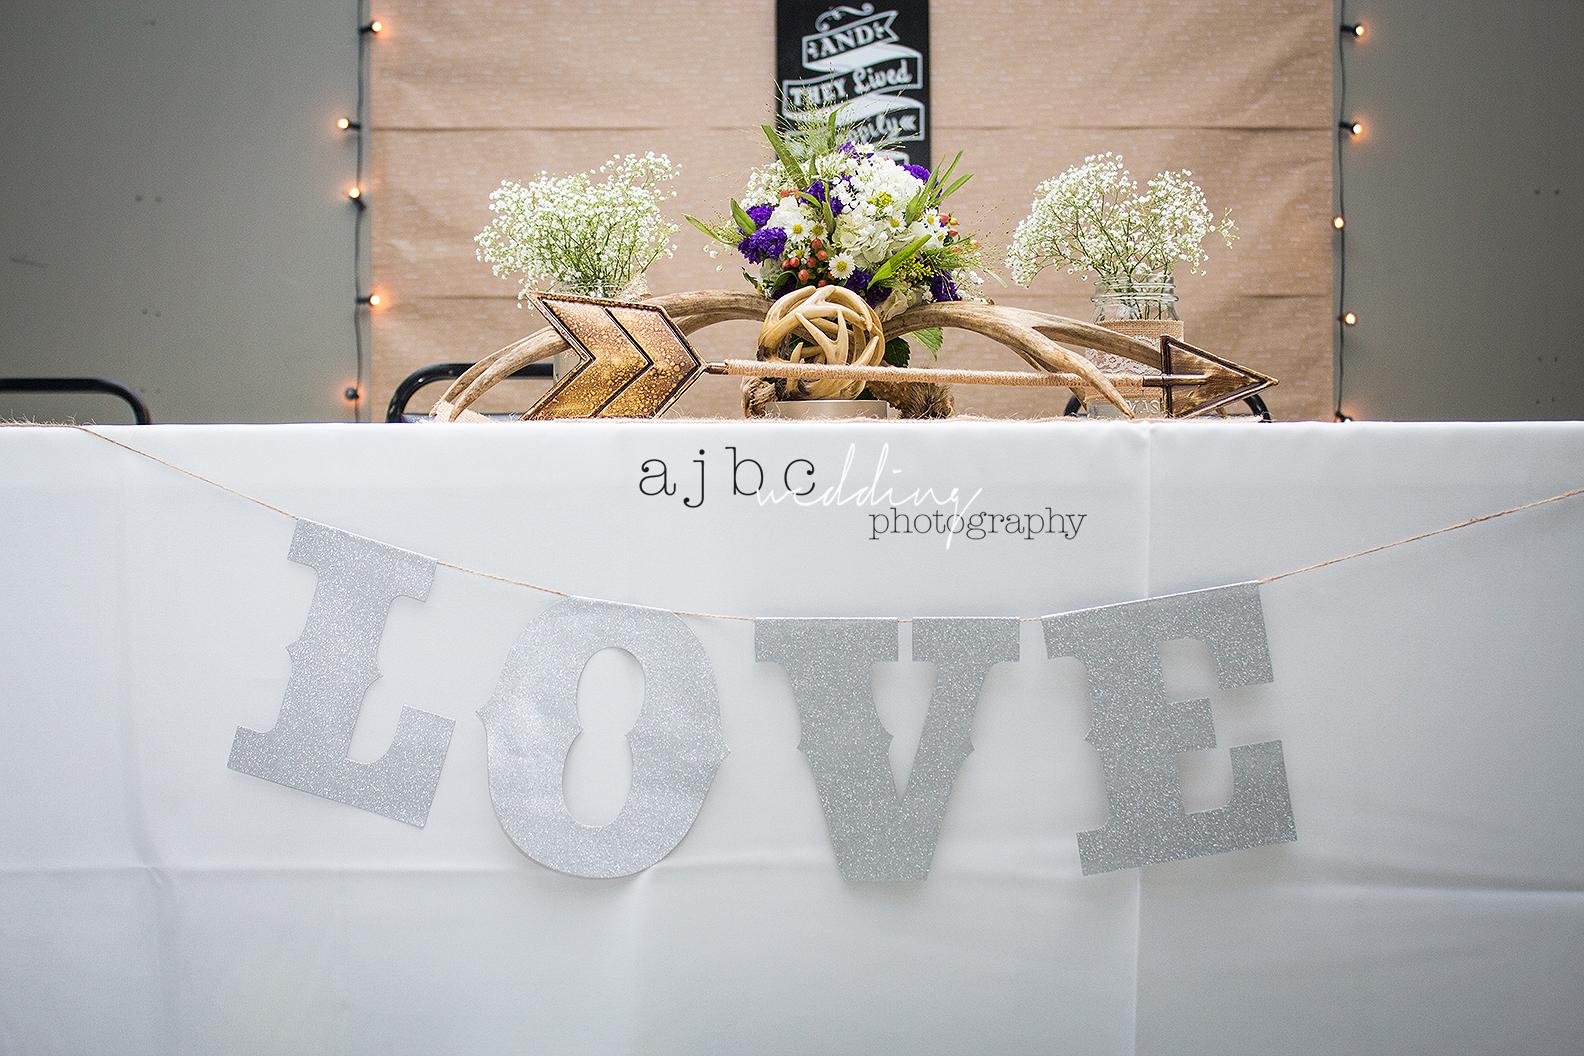 ajbcphotography-port-huron-michigan-wedding-photographer-outdoors-summer-wedding-country-wedding-wadhams-michigan-bride-vintage-wedding1.jpg